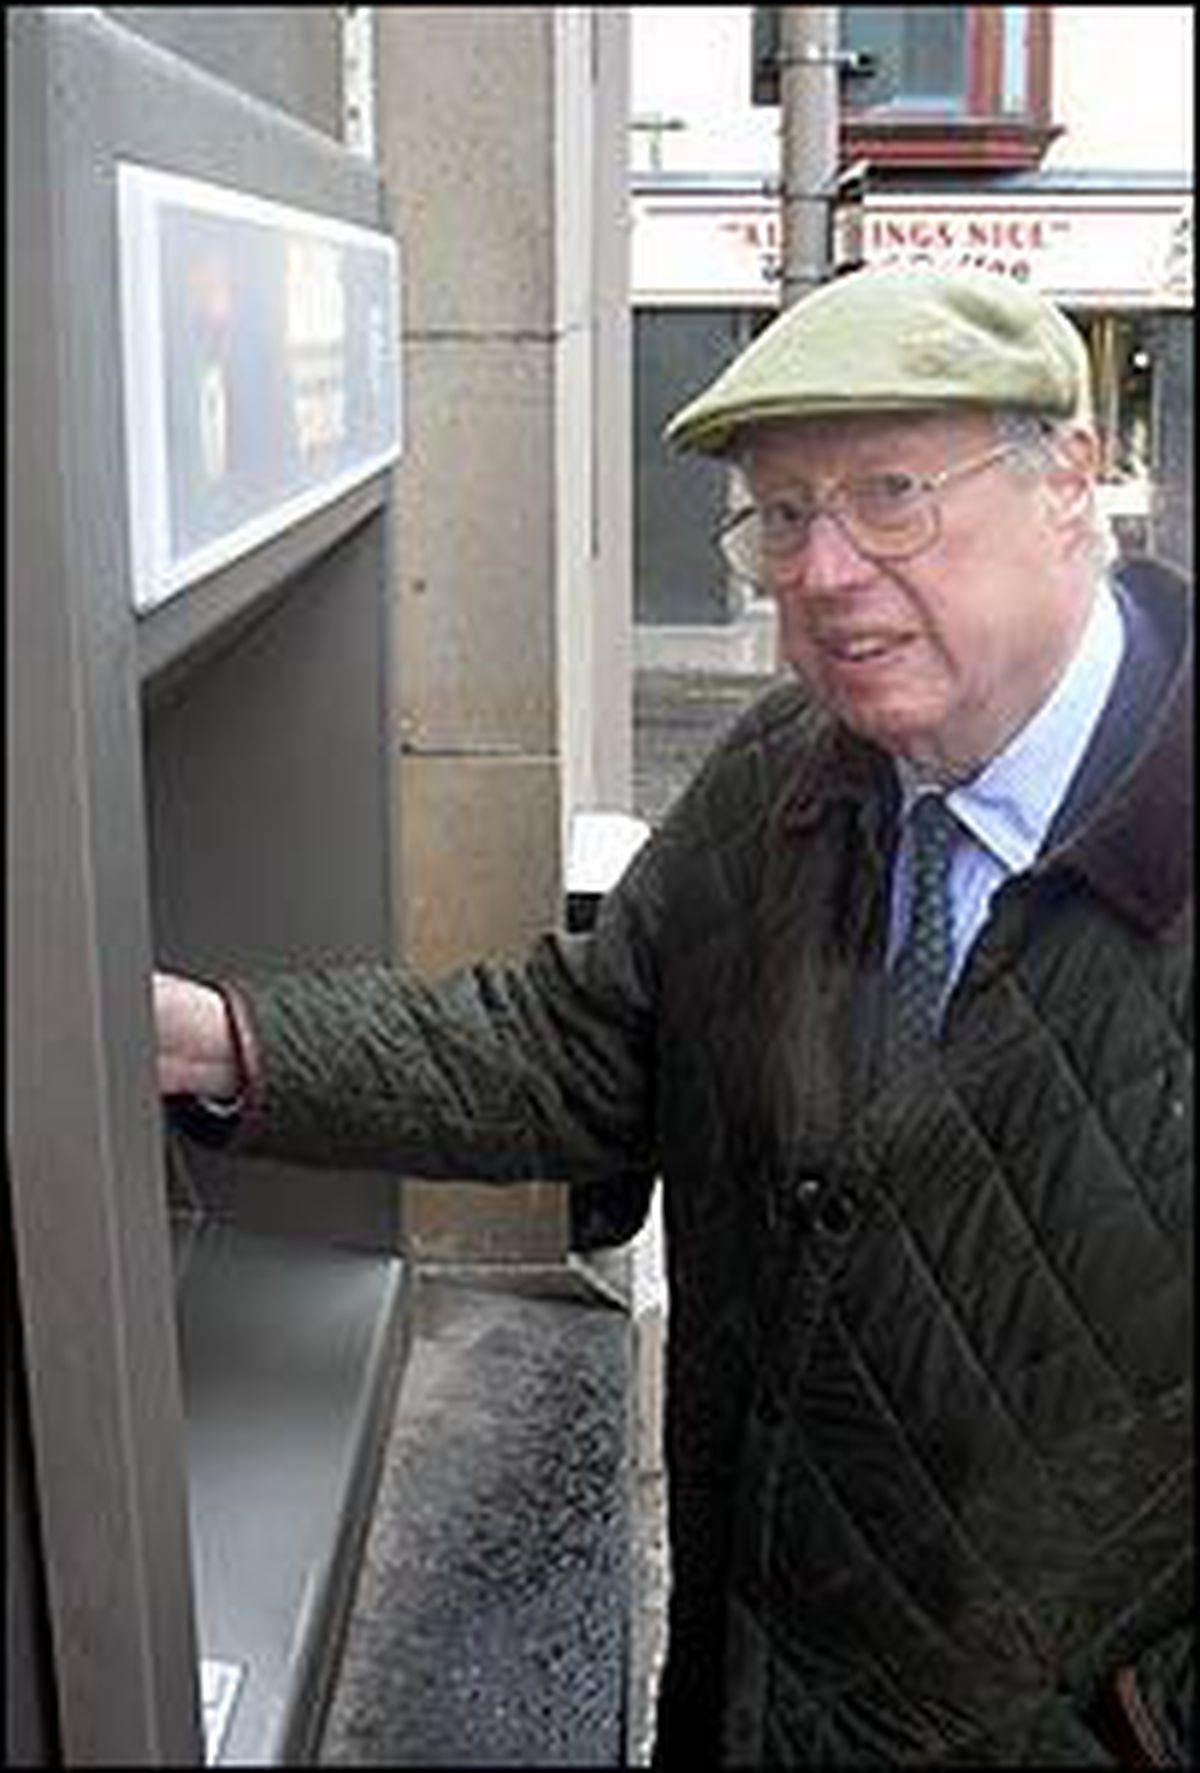 The man who invented the cashpoint – John Shepherd-Barron